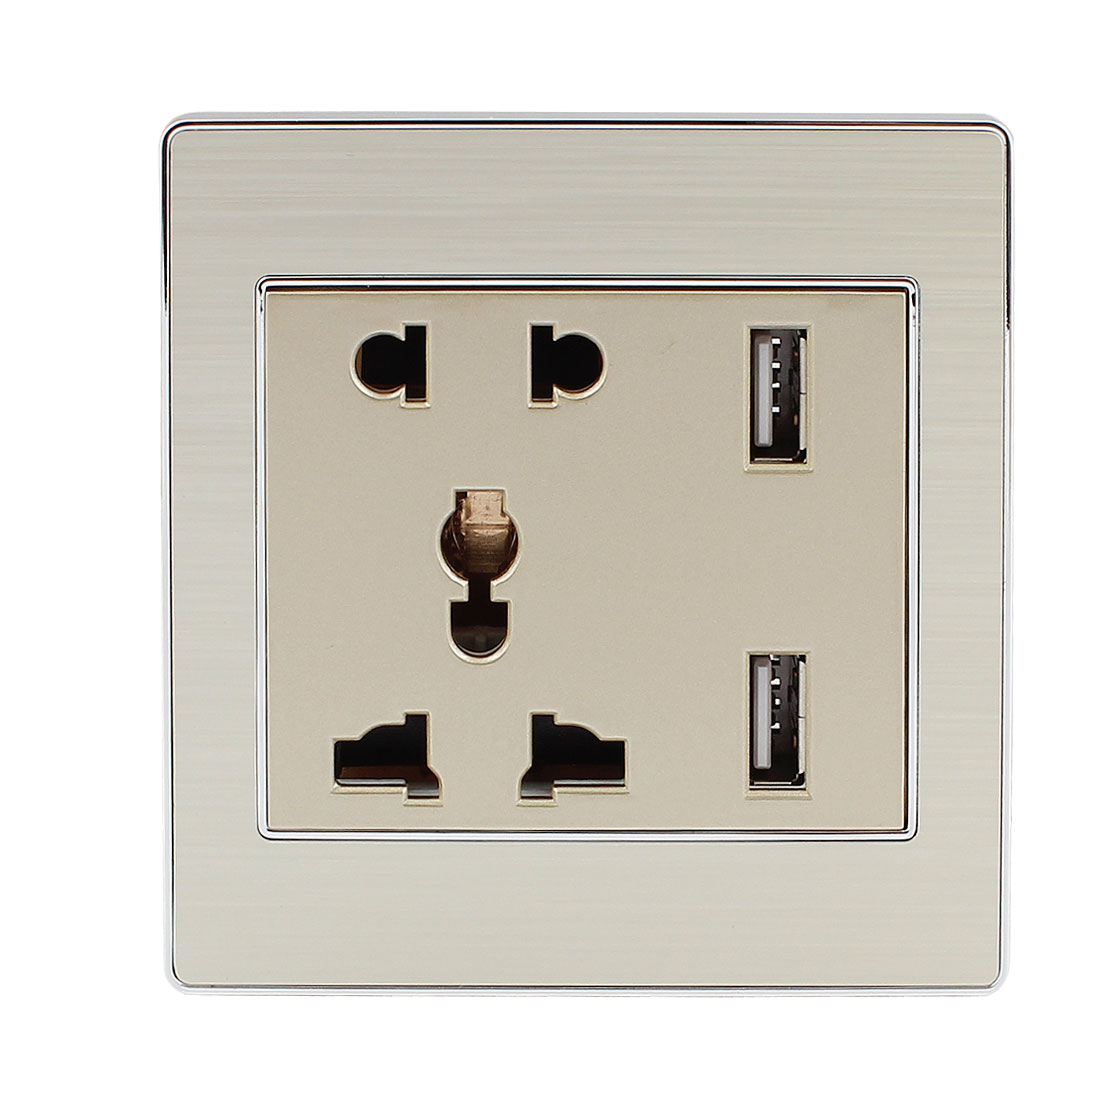 AC 110V-250V AU EU UK US Socket 2 USB Port Charger DC 5V 2100mA Mains Power Receptacle